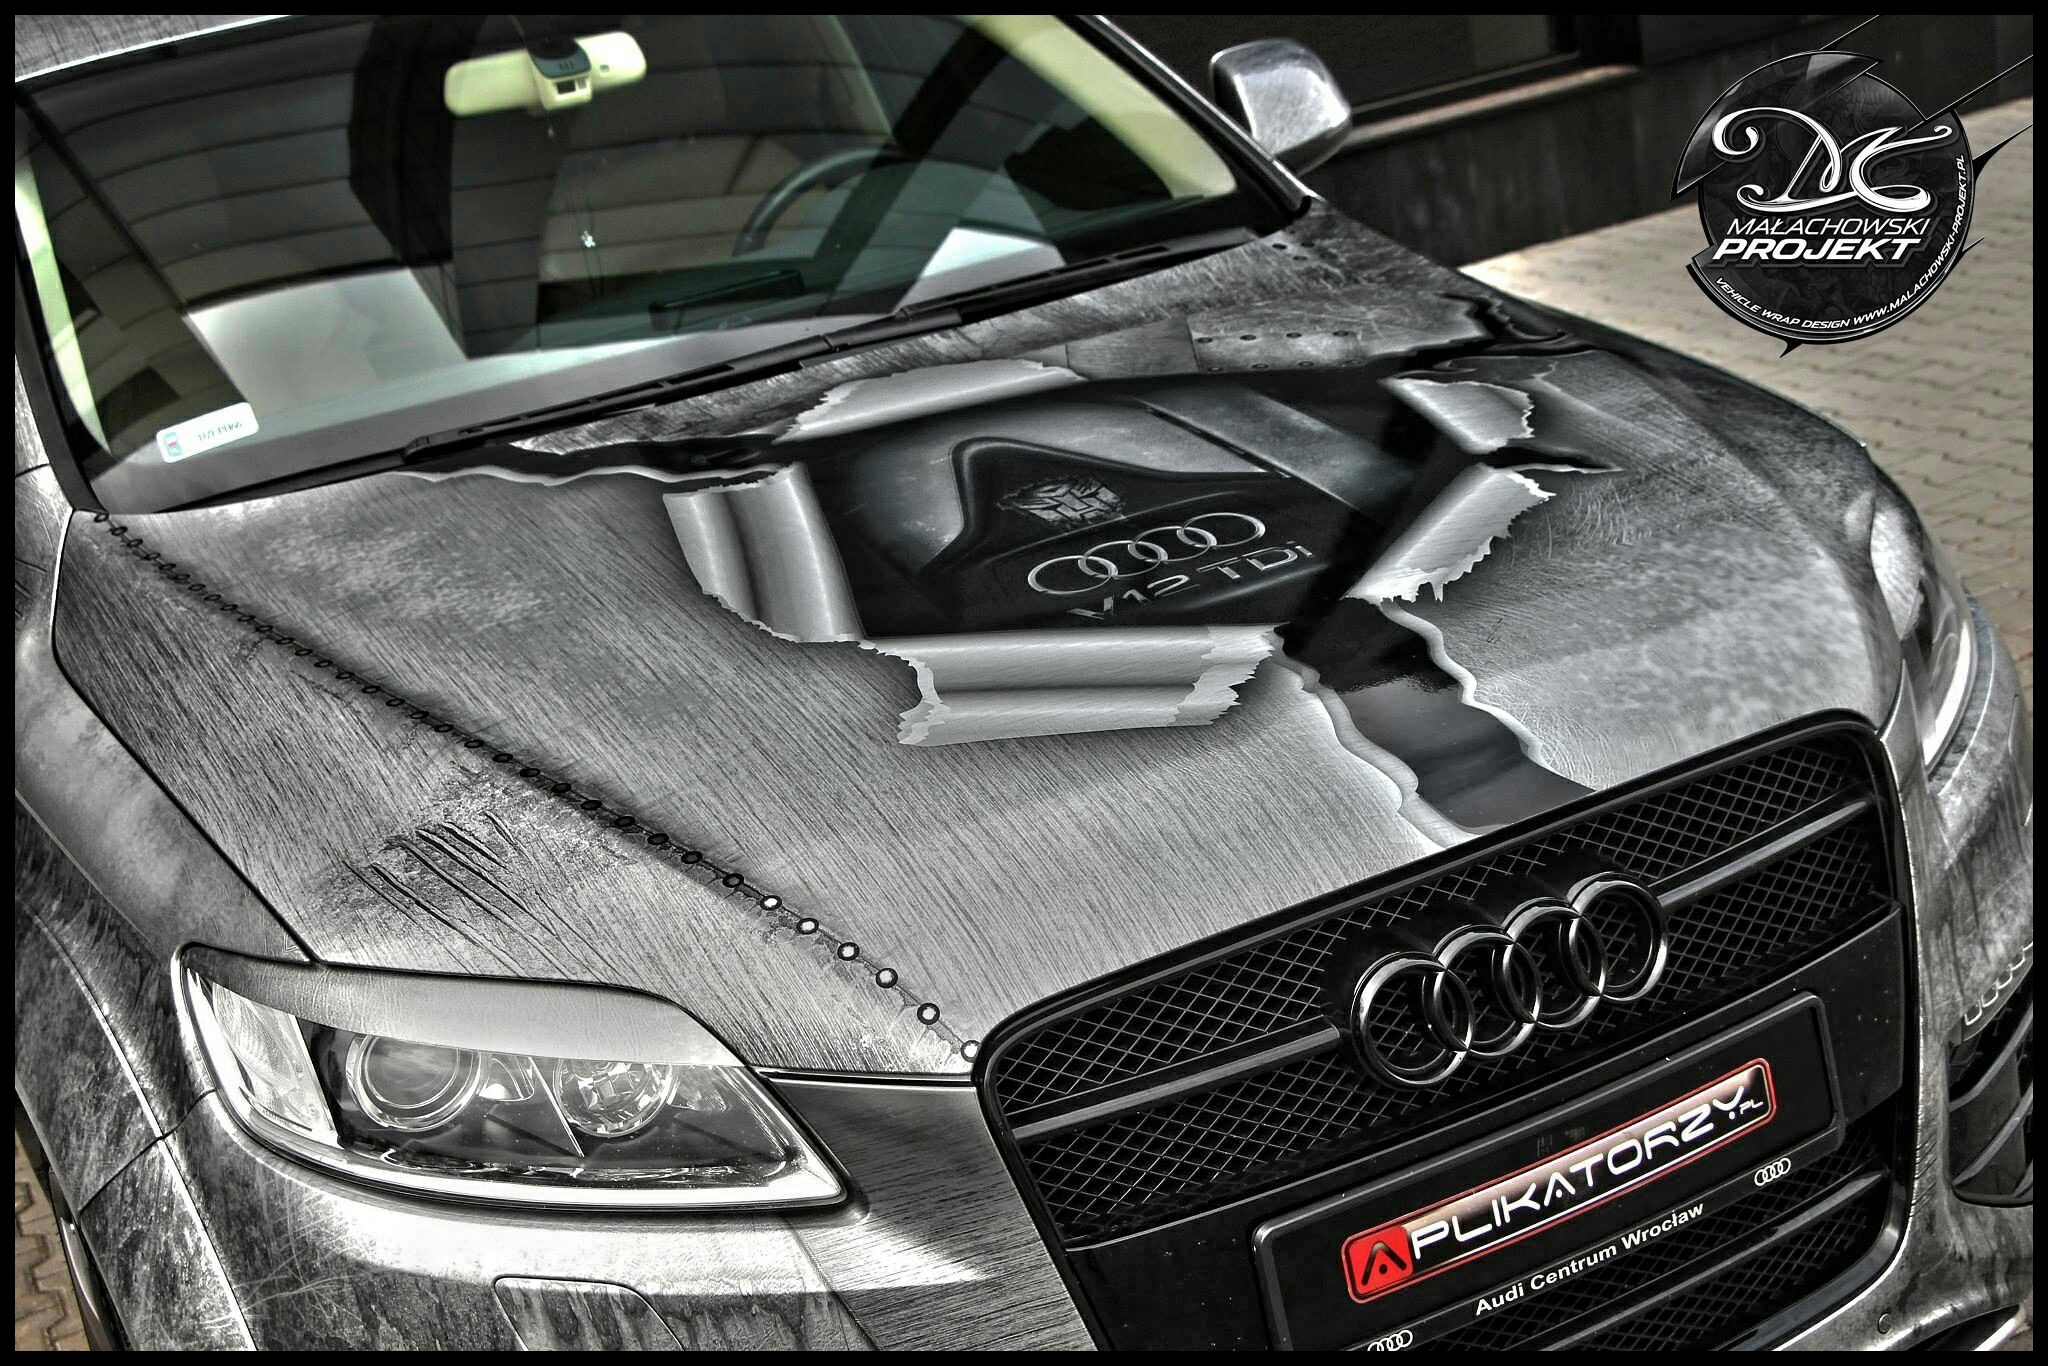 Audi Miami Fl Beautiful Pin by Dwh Love for Audi Pinterest